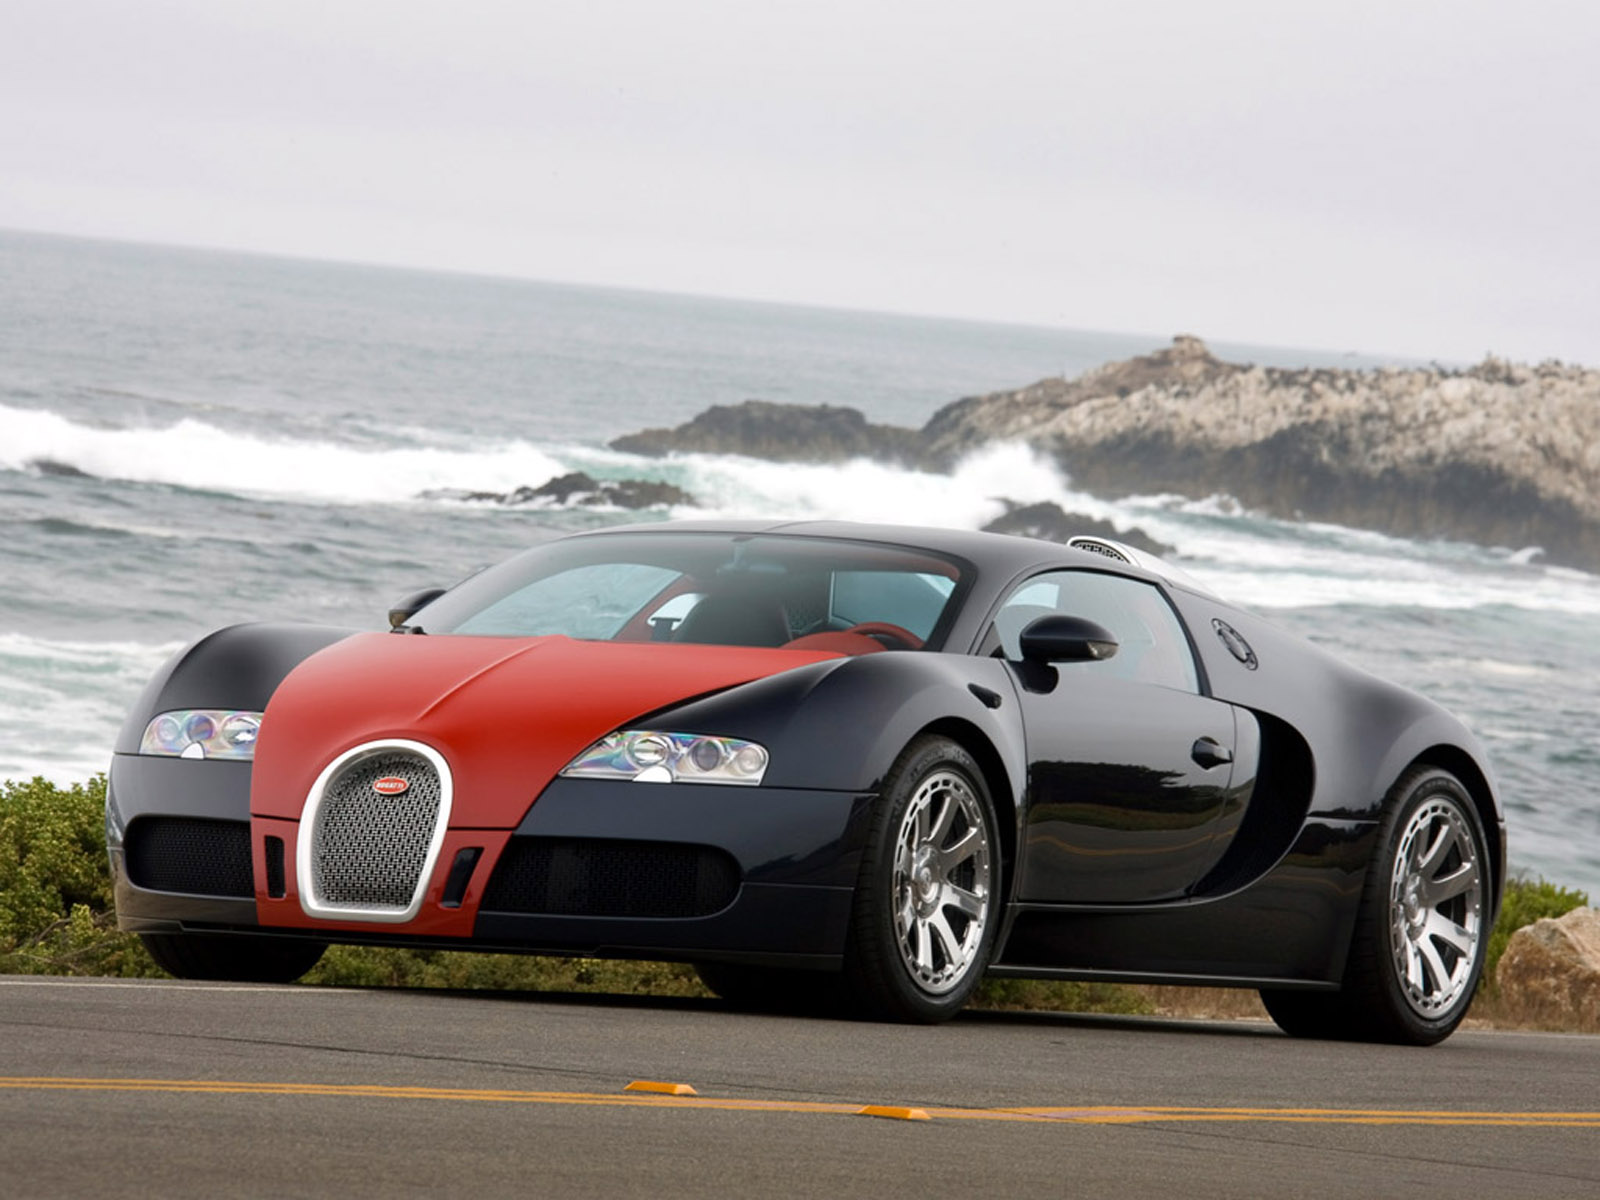 car bugatti veyron grand sport bugatti Free Download Image Of